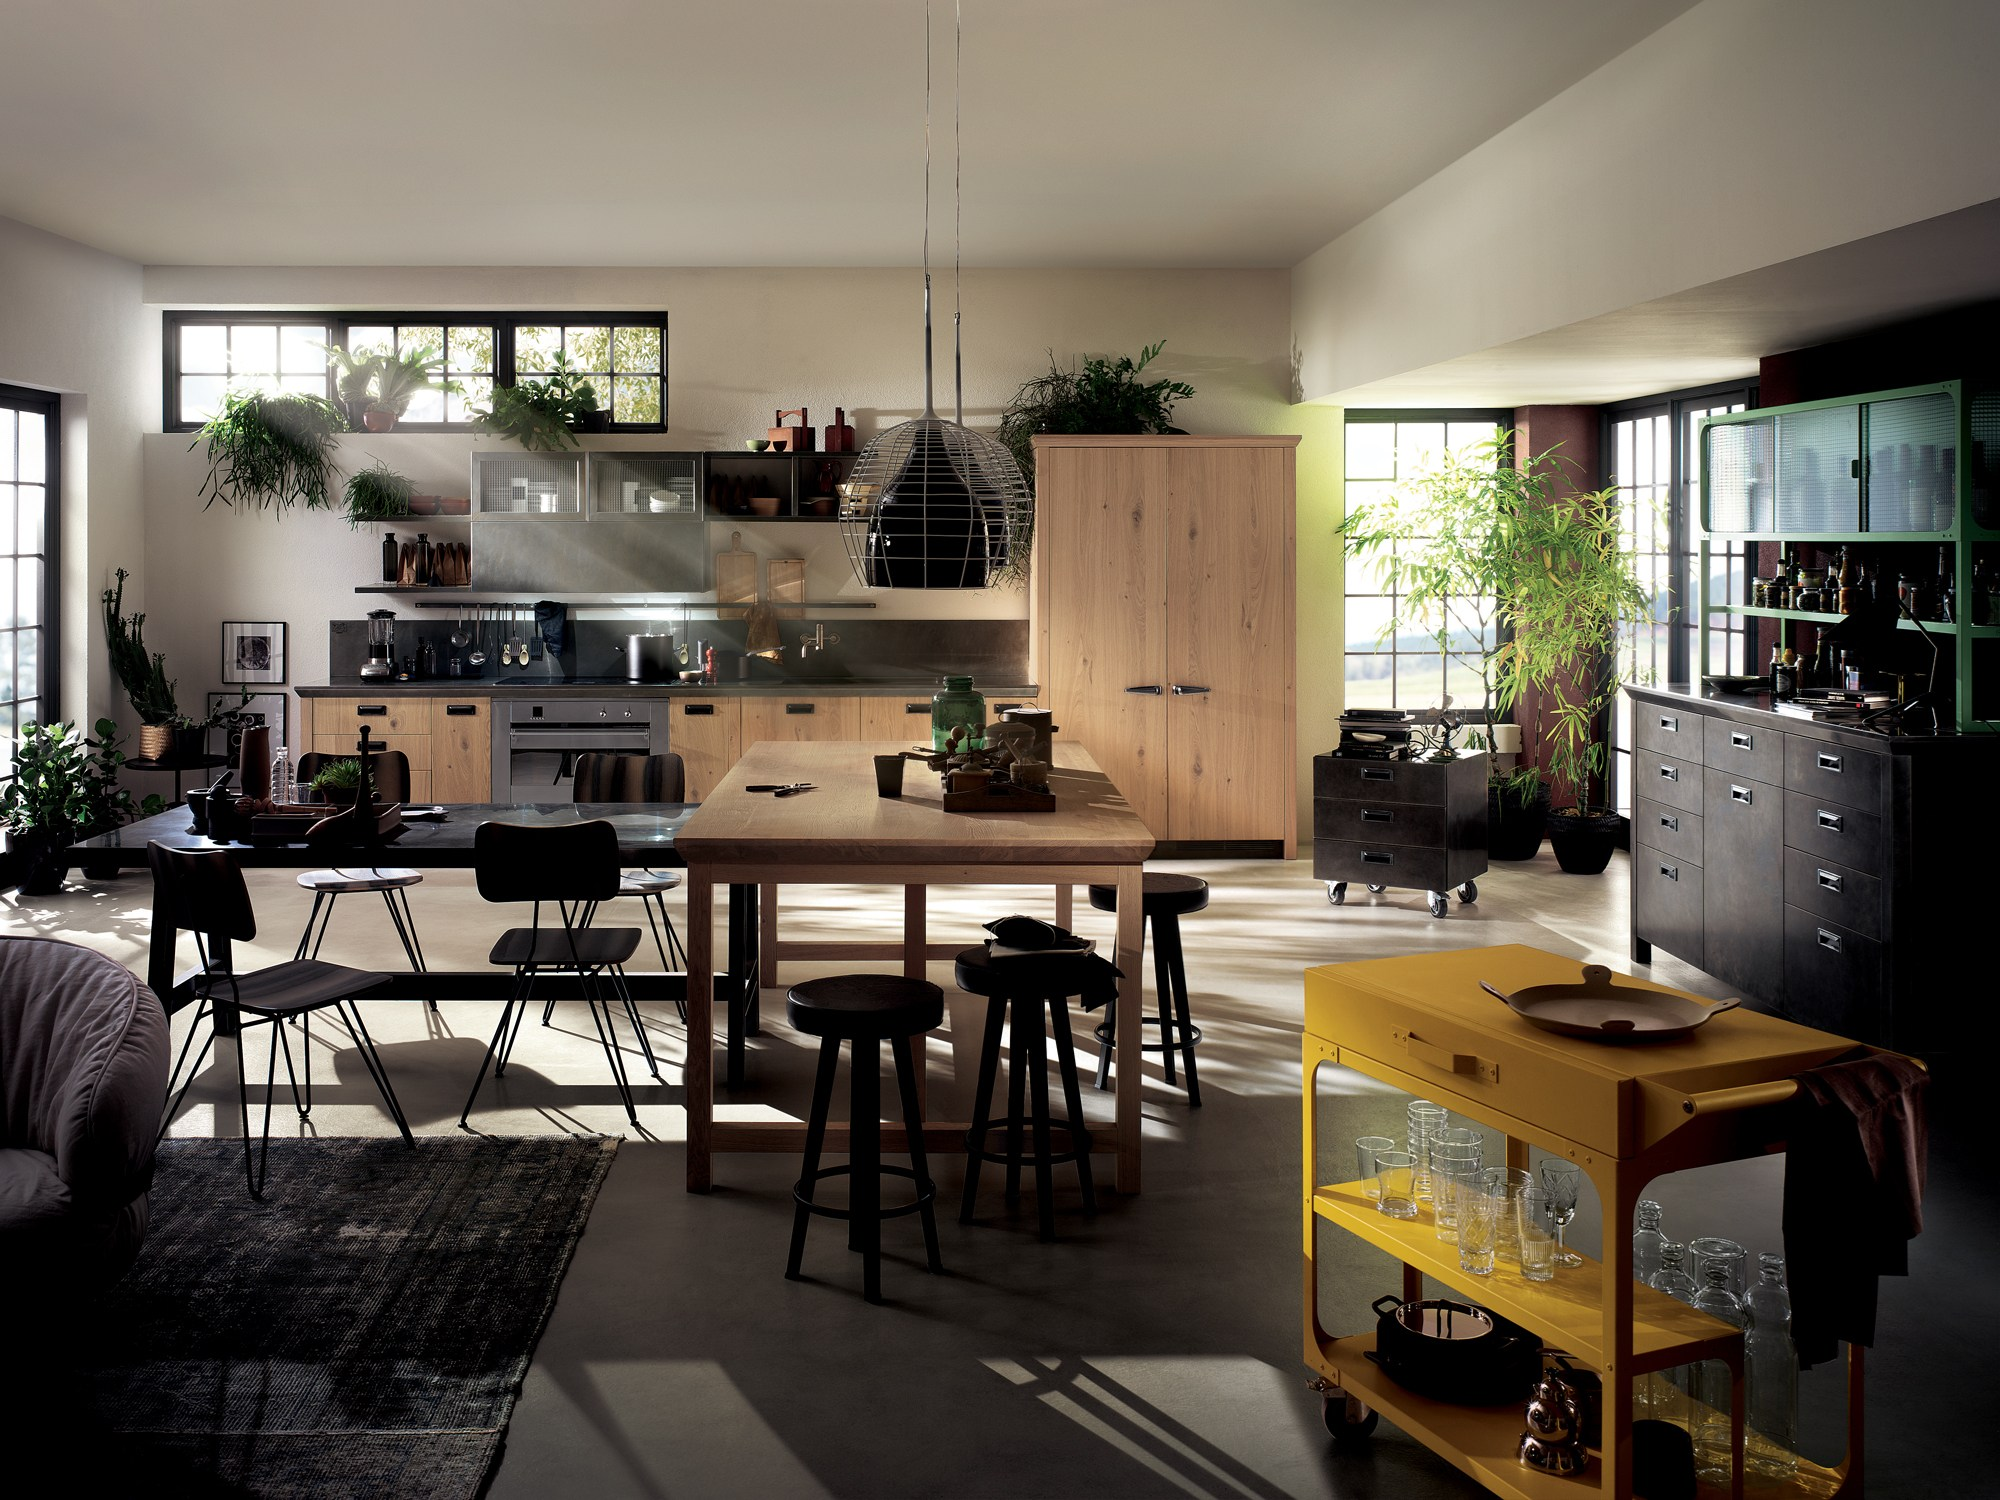 Cucina componibile diesel social kitchen linea scavolini by scavolini design diesel living with - Living e cucina ...